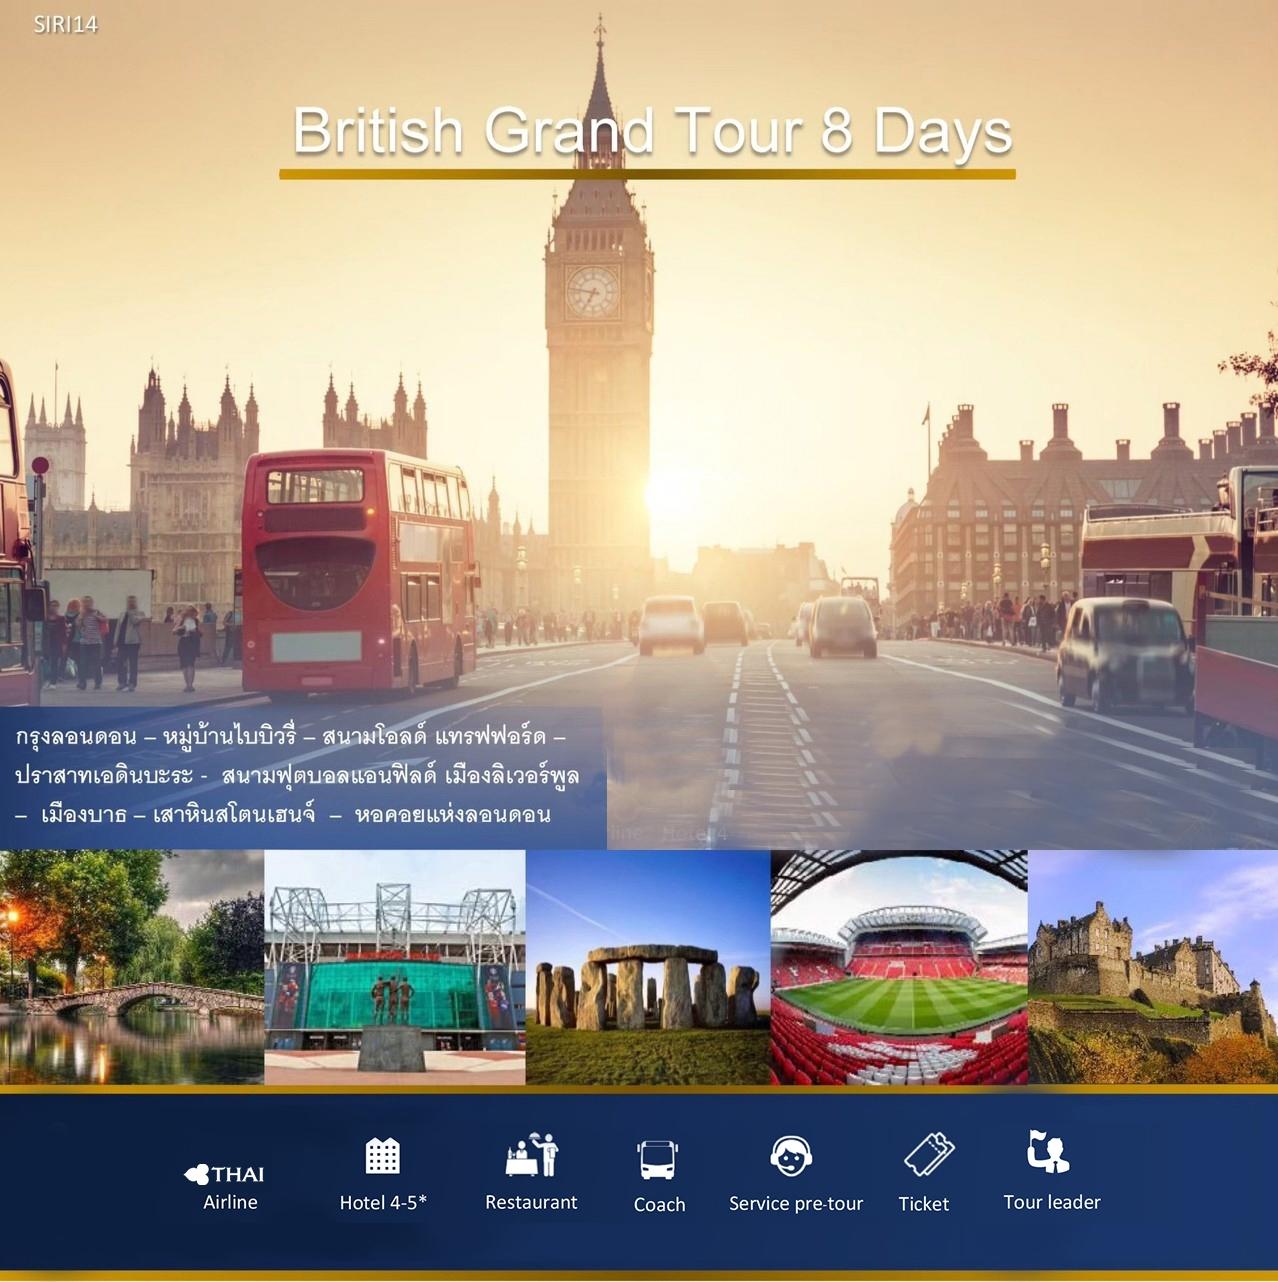 British grand tour